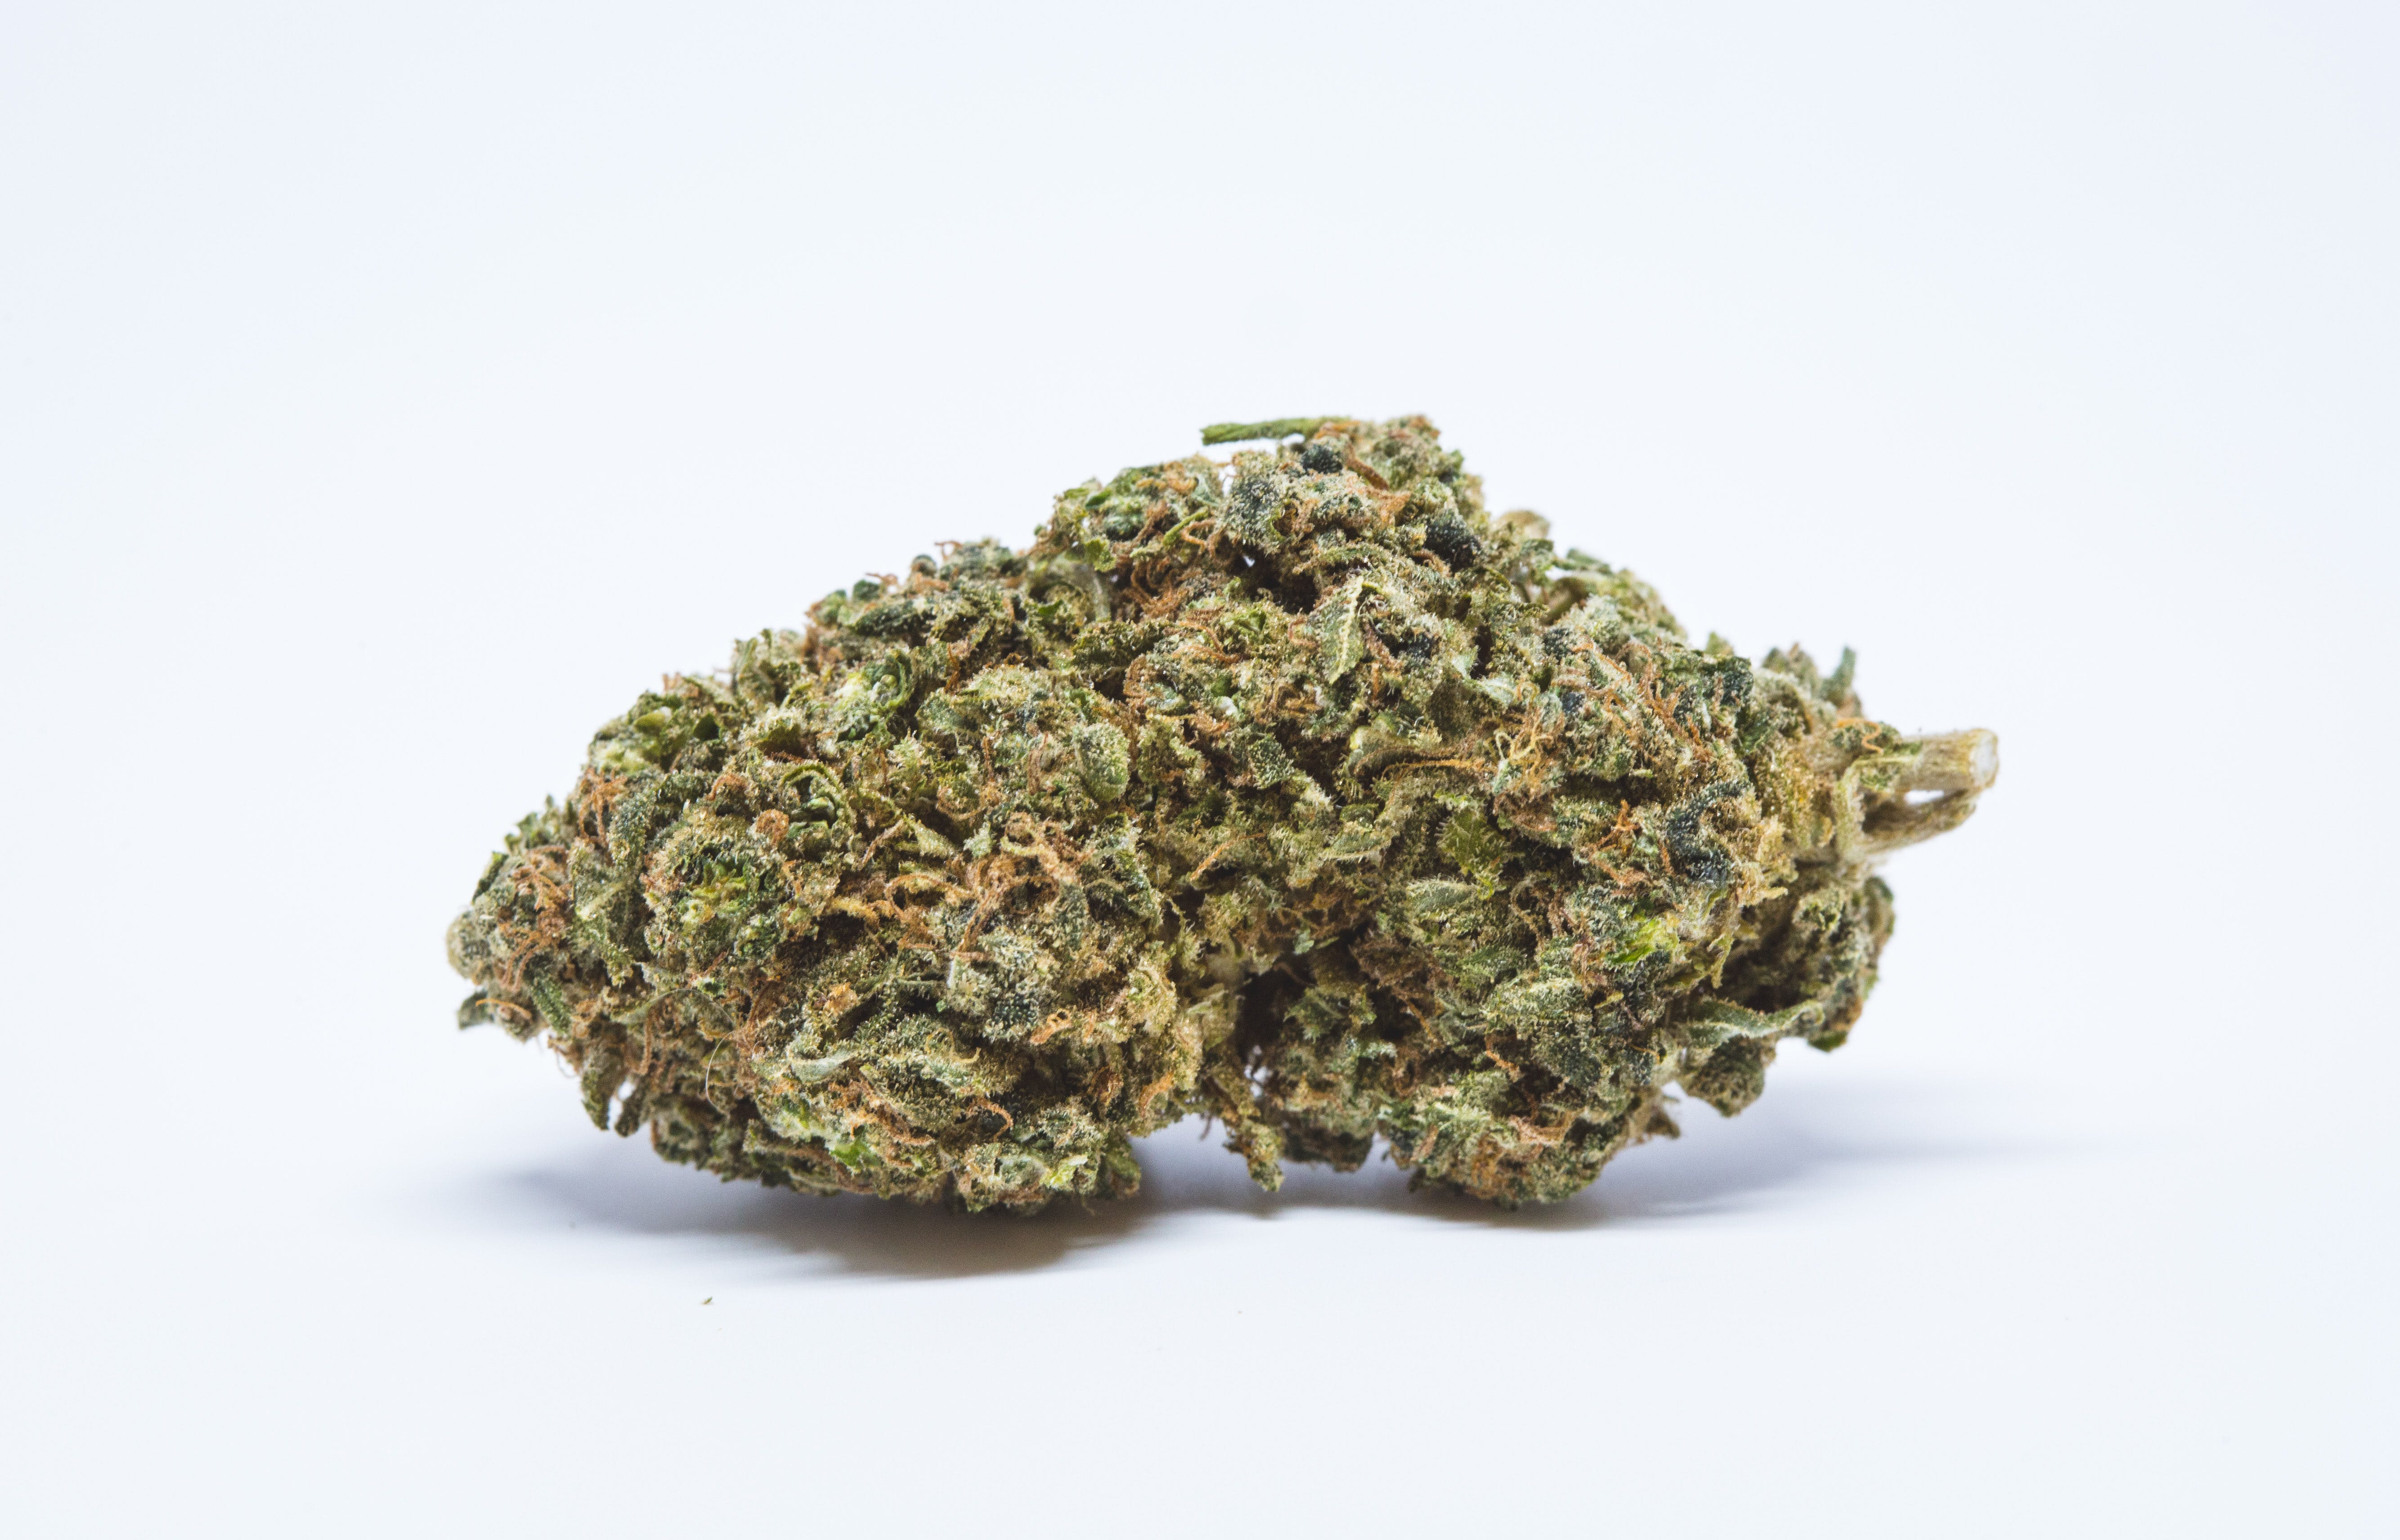 Harle-Tsu Weed; Harle-Tsu Cannabis Strain; Harle-Tsu Hybrid Strain